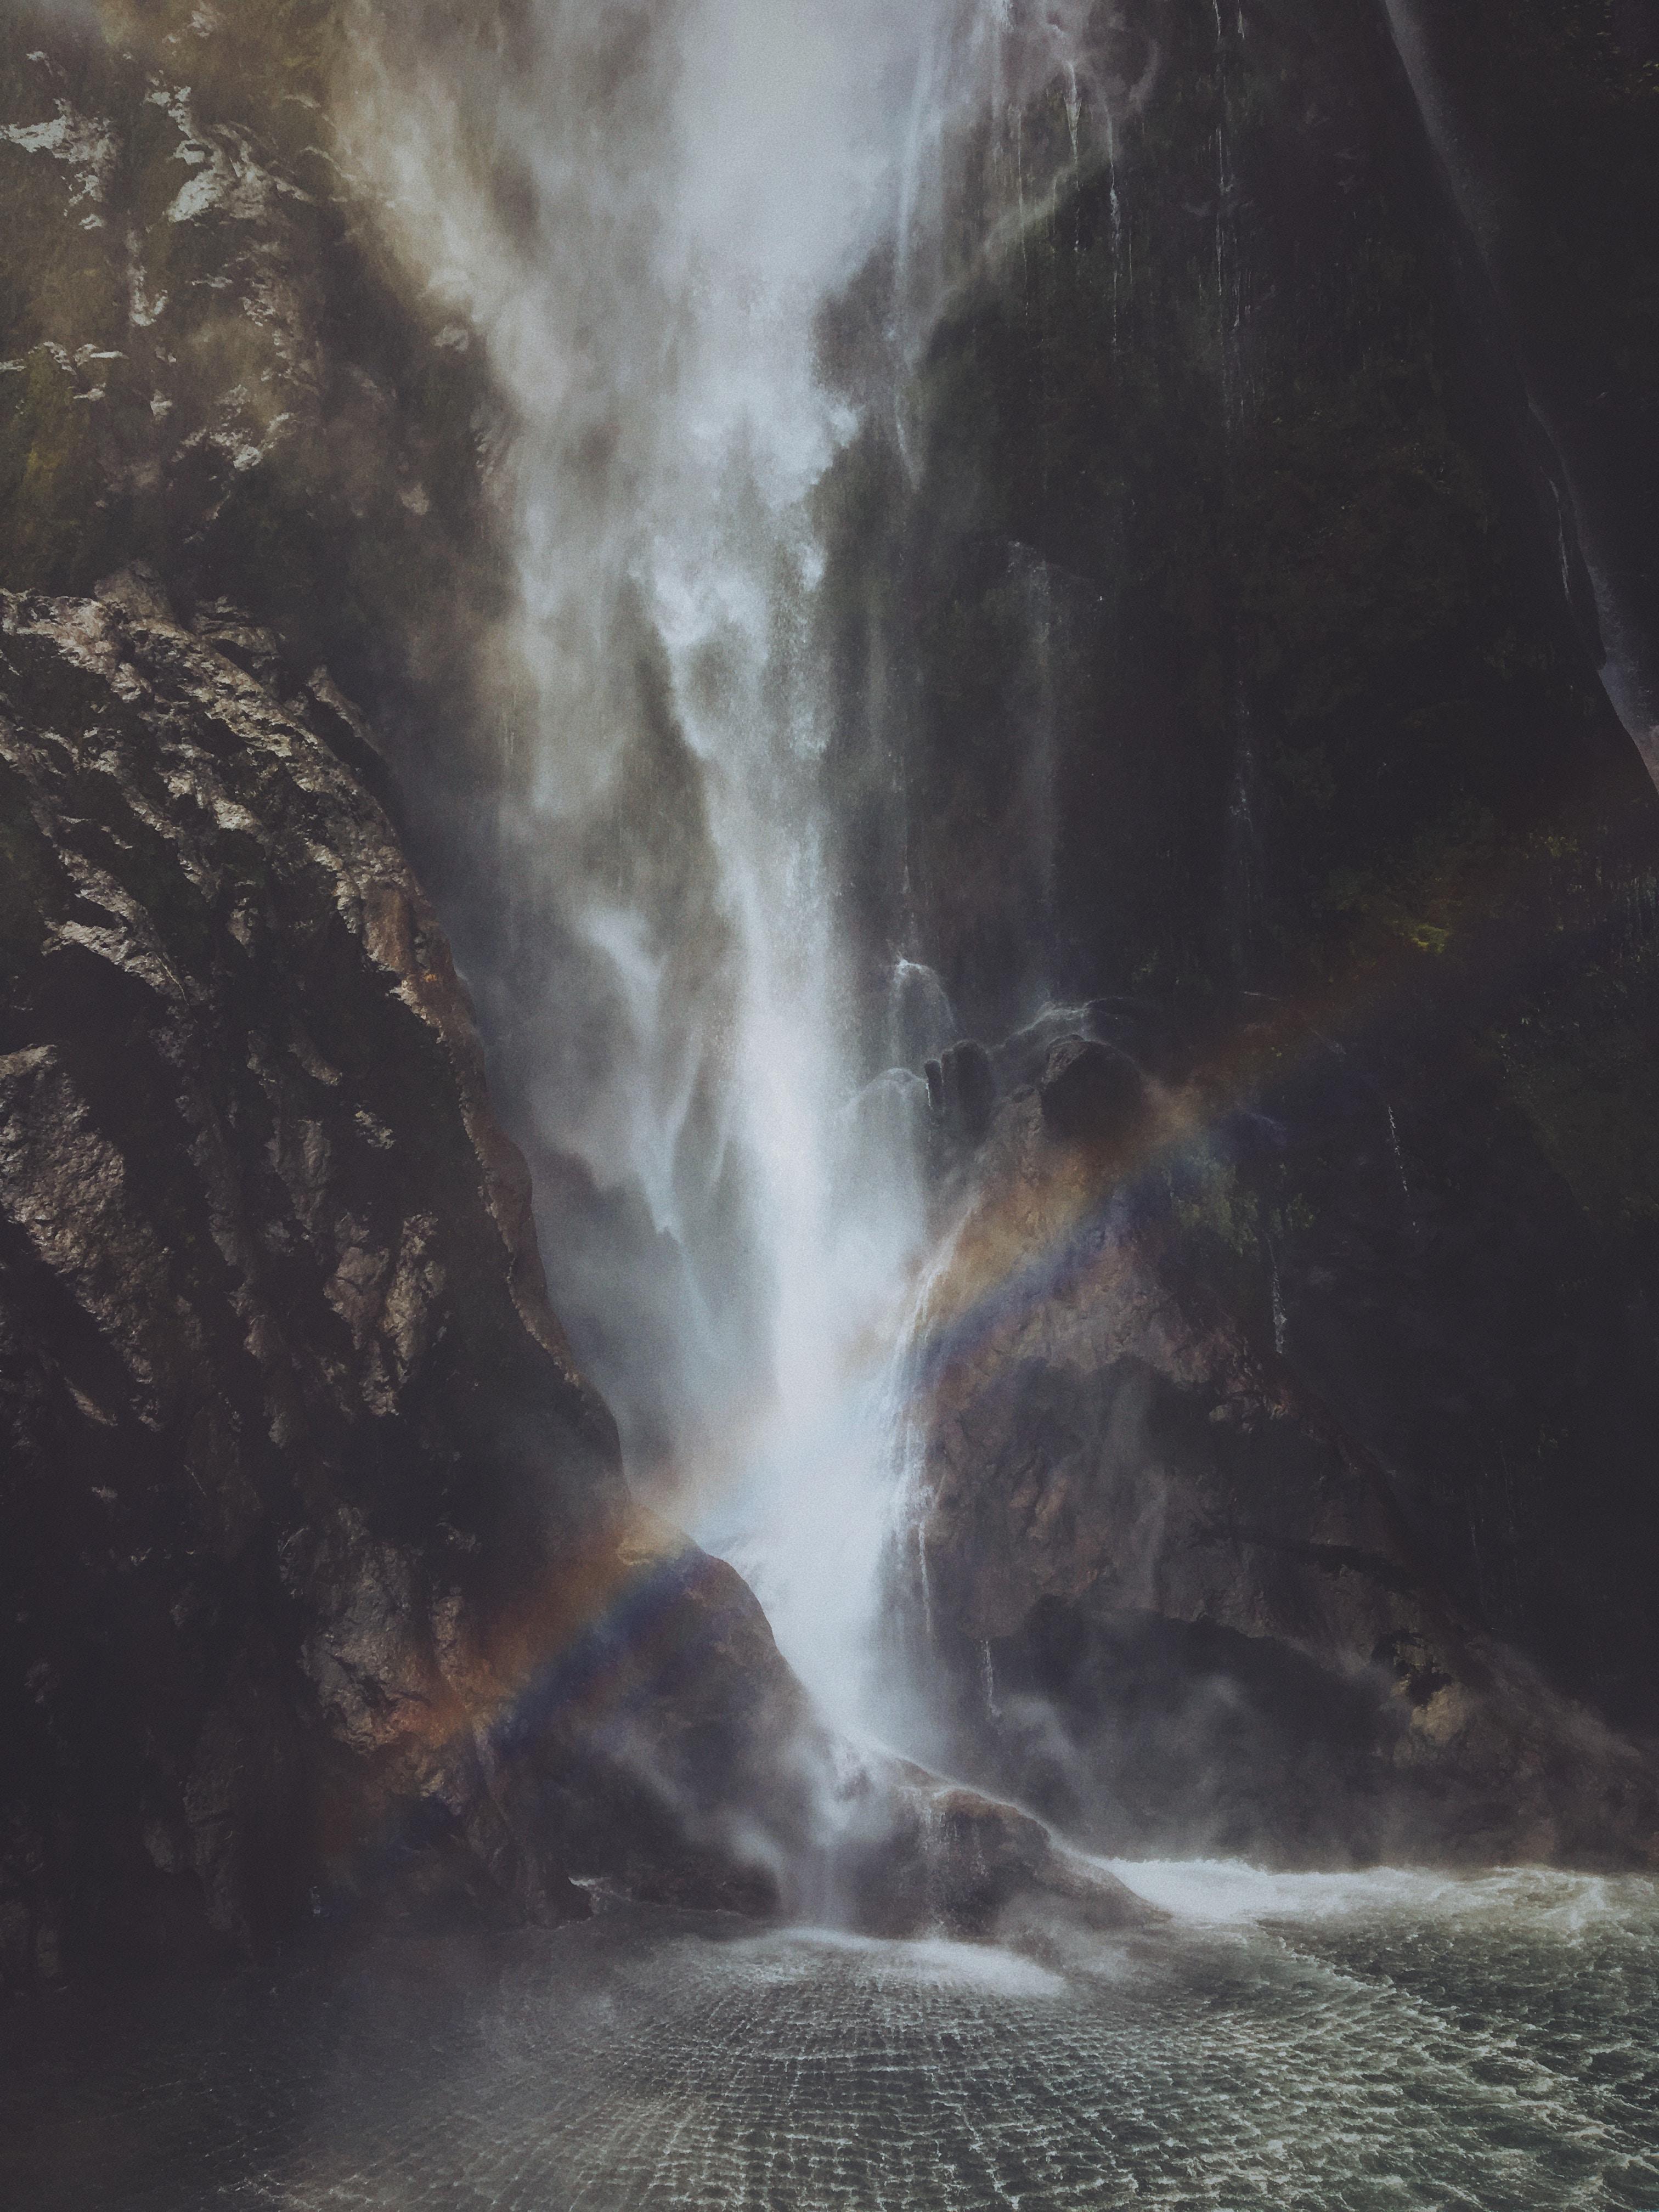 rainbow near the waterfalls